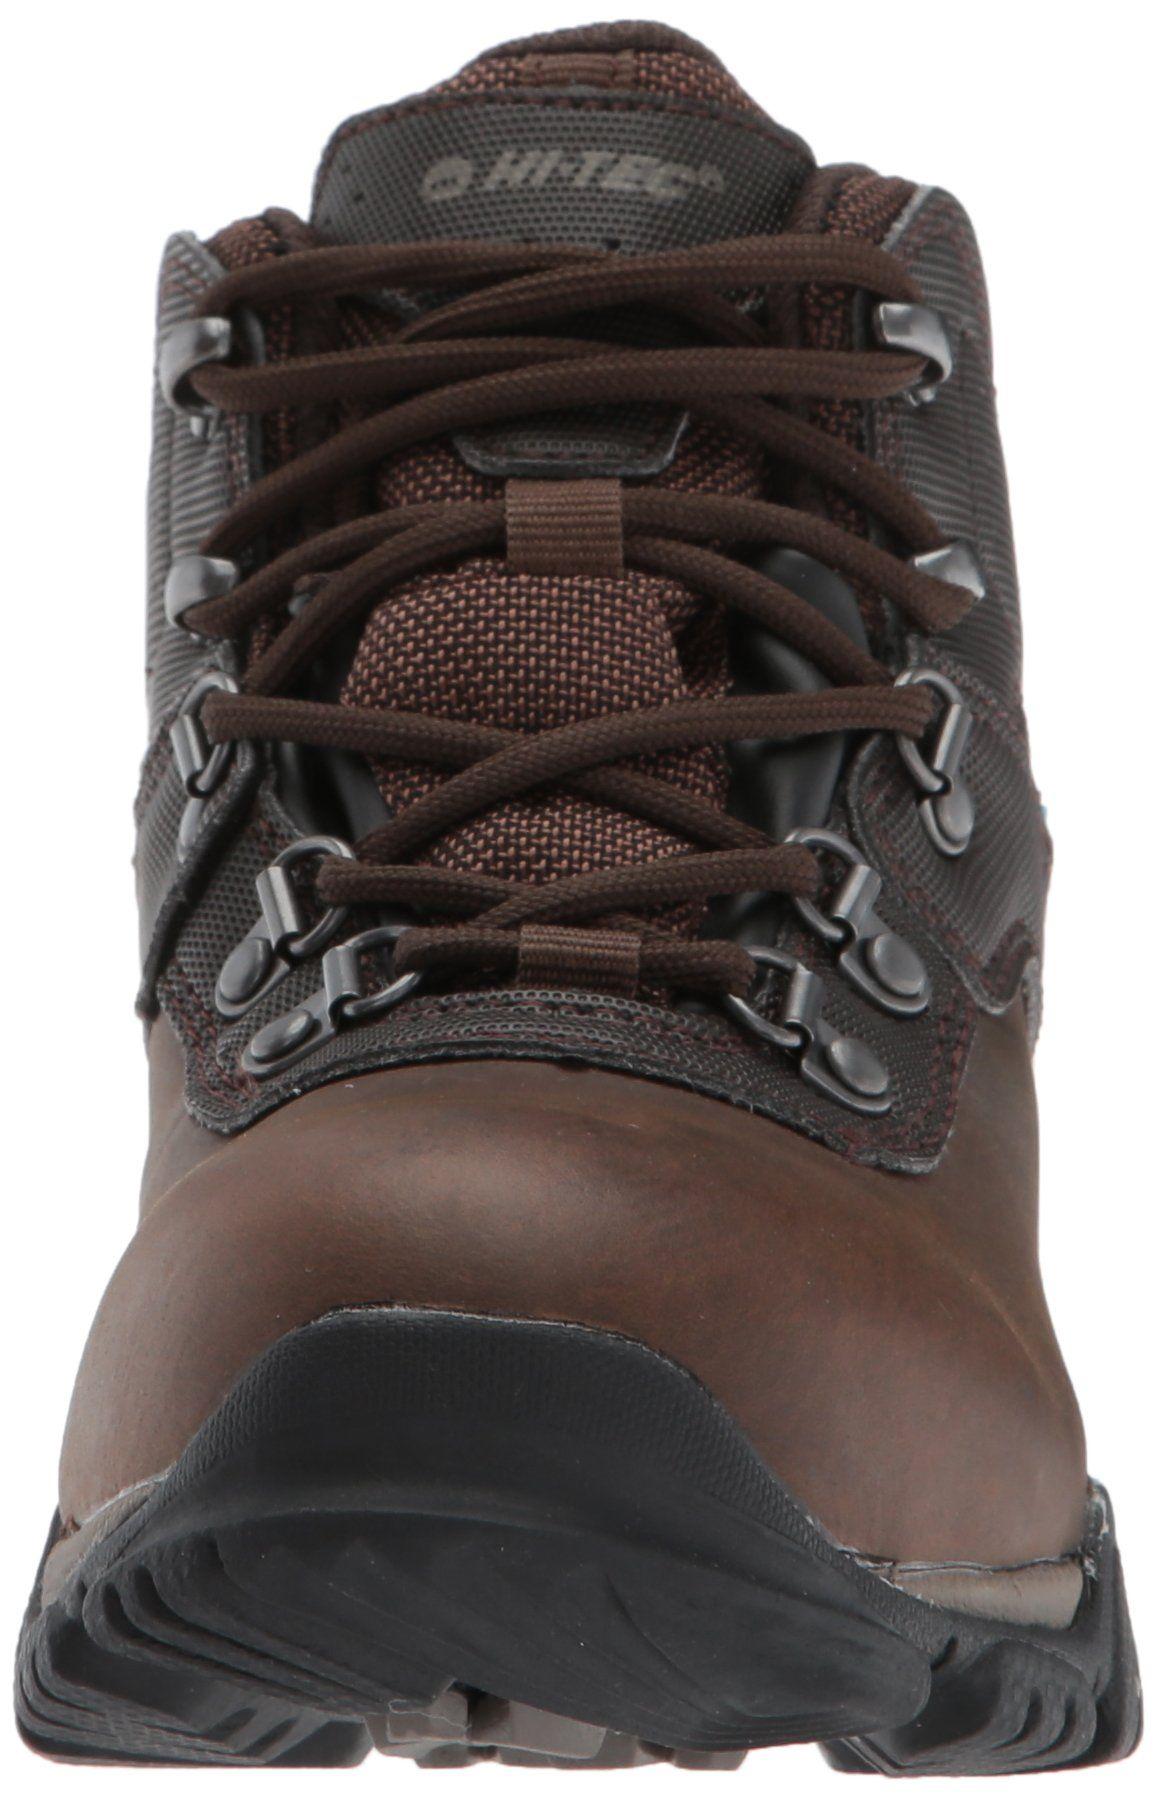 4c3e81e7a05 HiTec Unisex Altitude VI Jr Waterproof Hiking Boot Dark Chocolate 12 ...